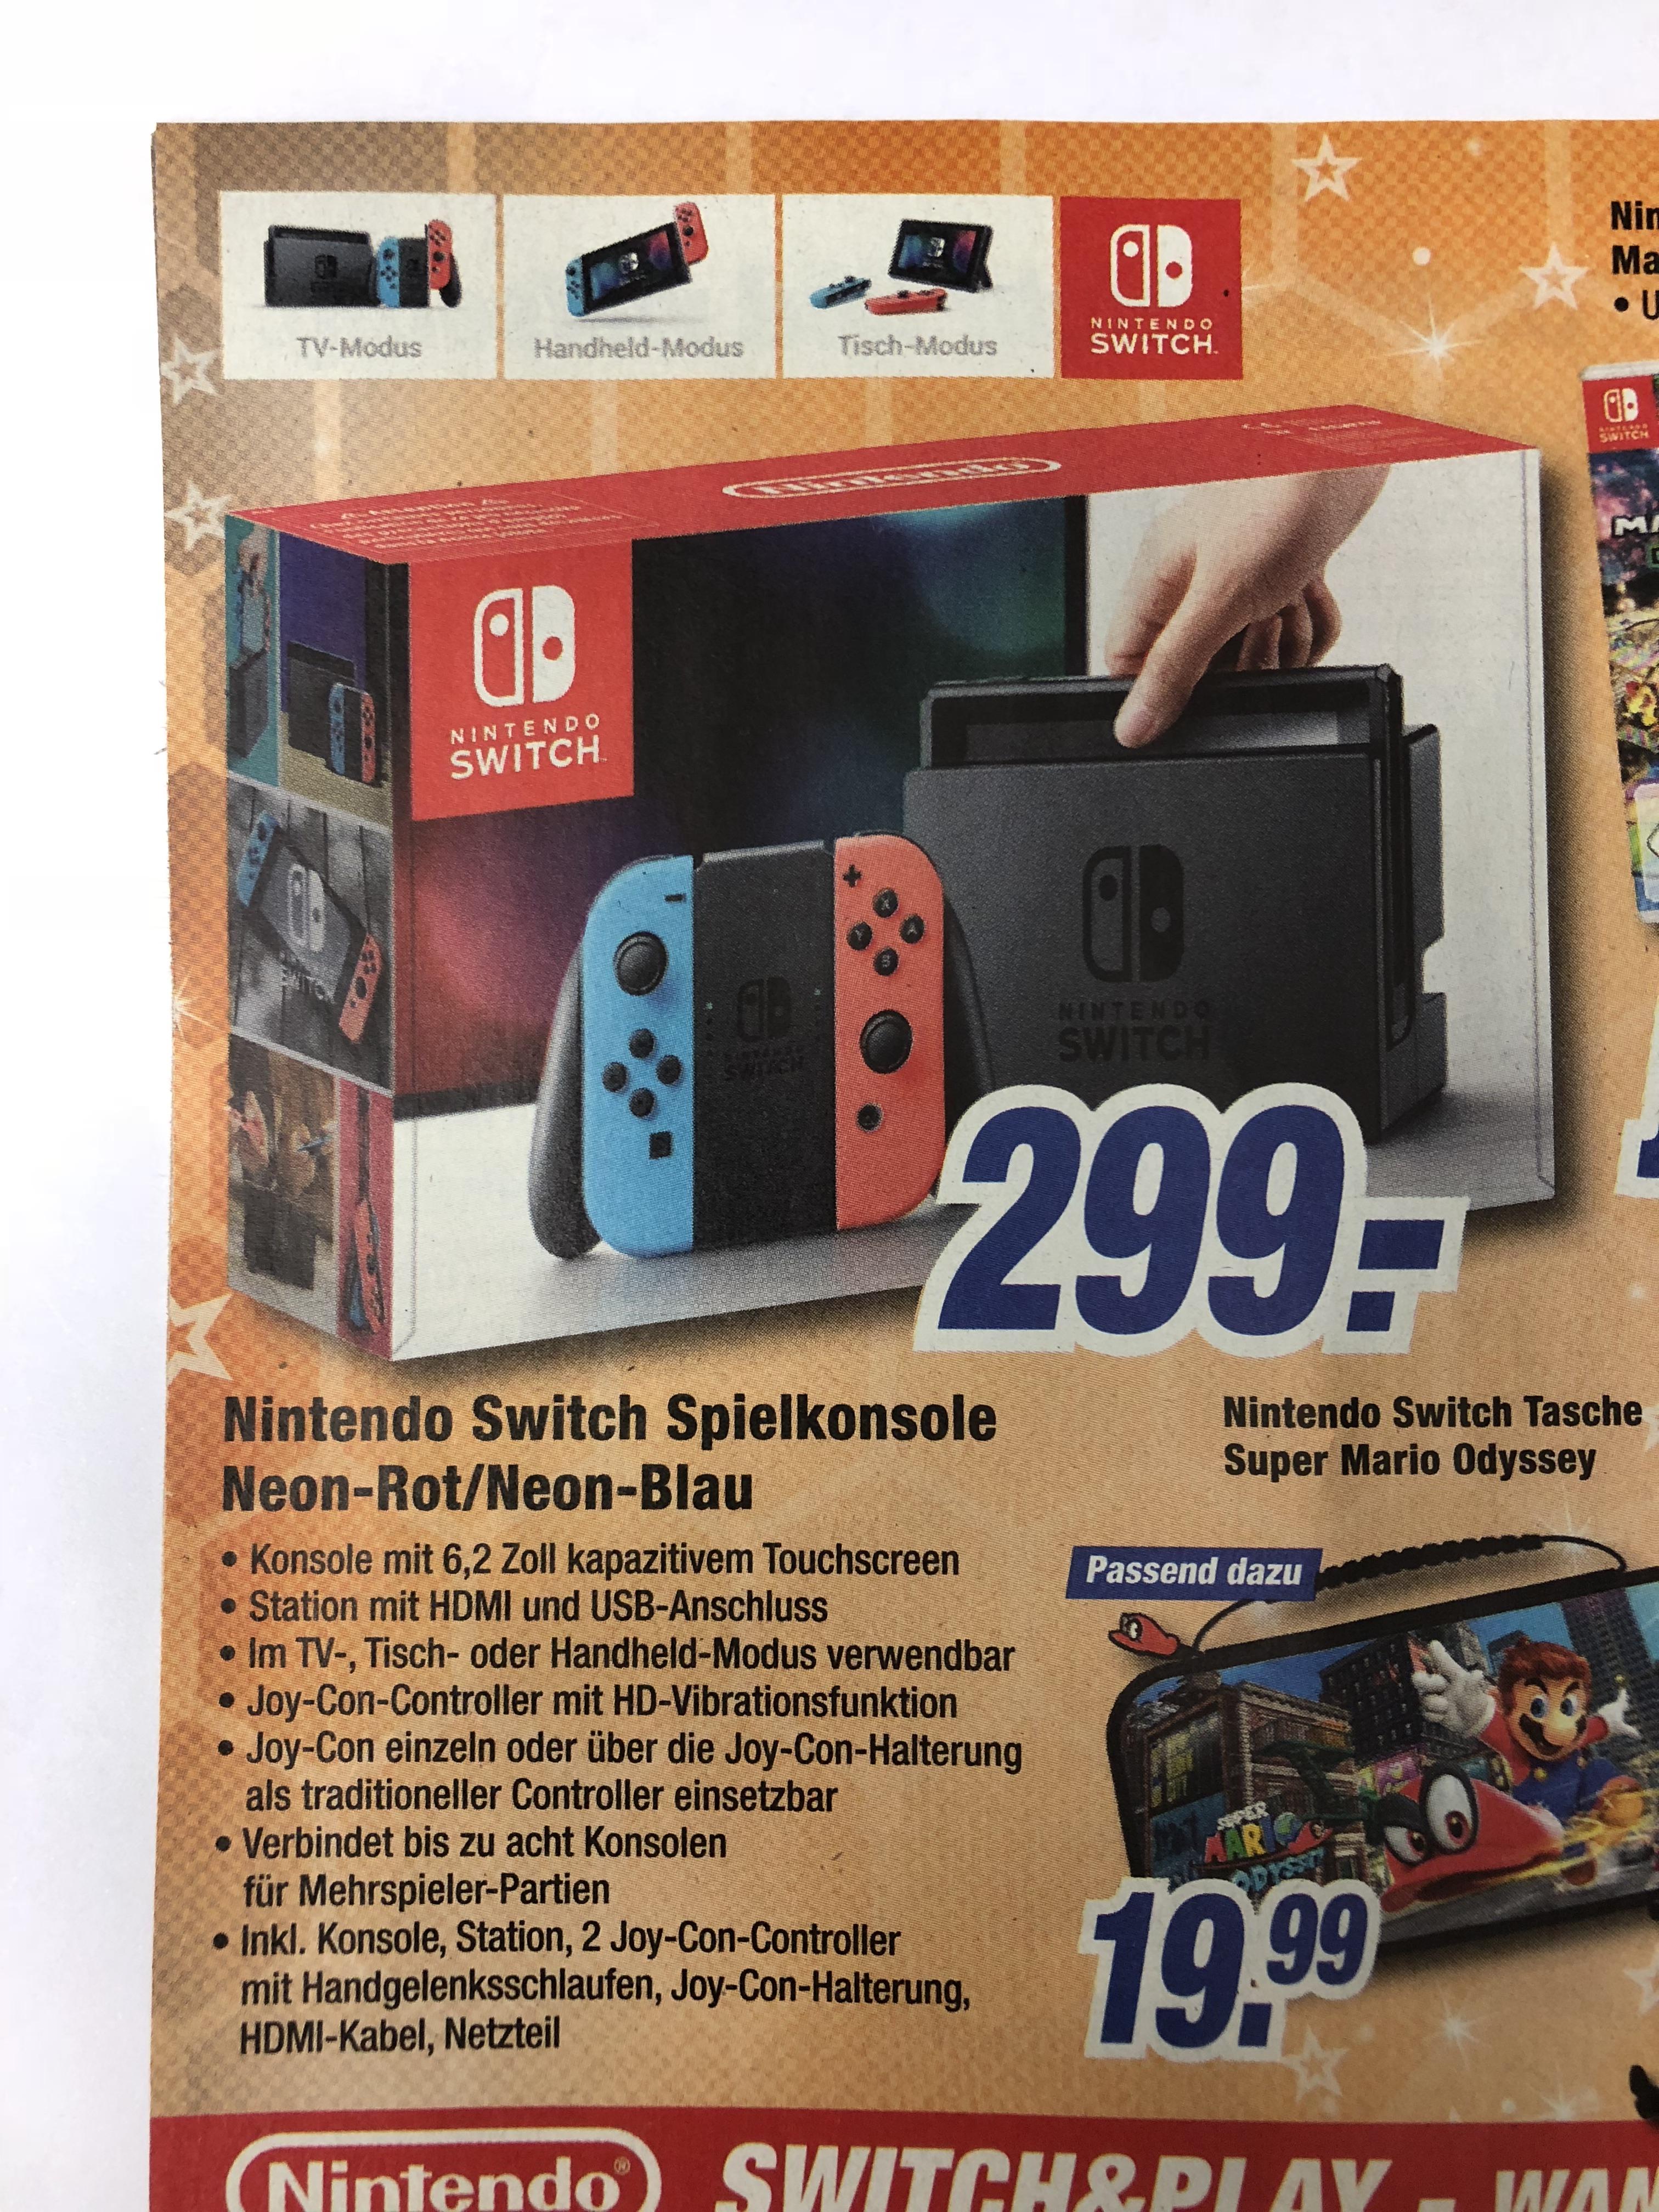 [Lokal] expert Allgäu: Nintendo Switch rot/blau (Online Bestellung +3,99€ VSK möglich!)